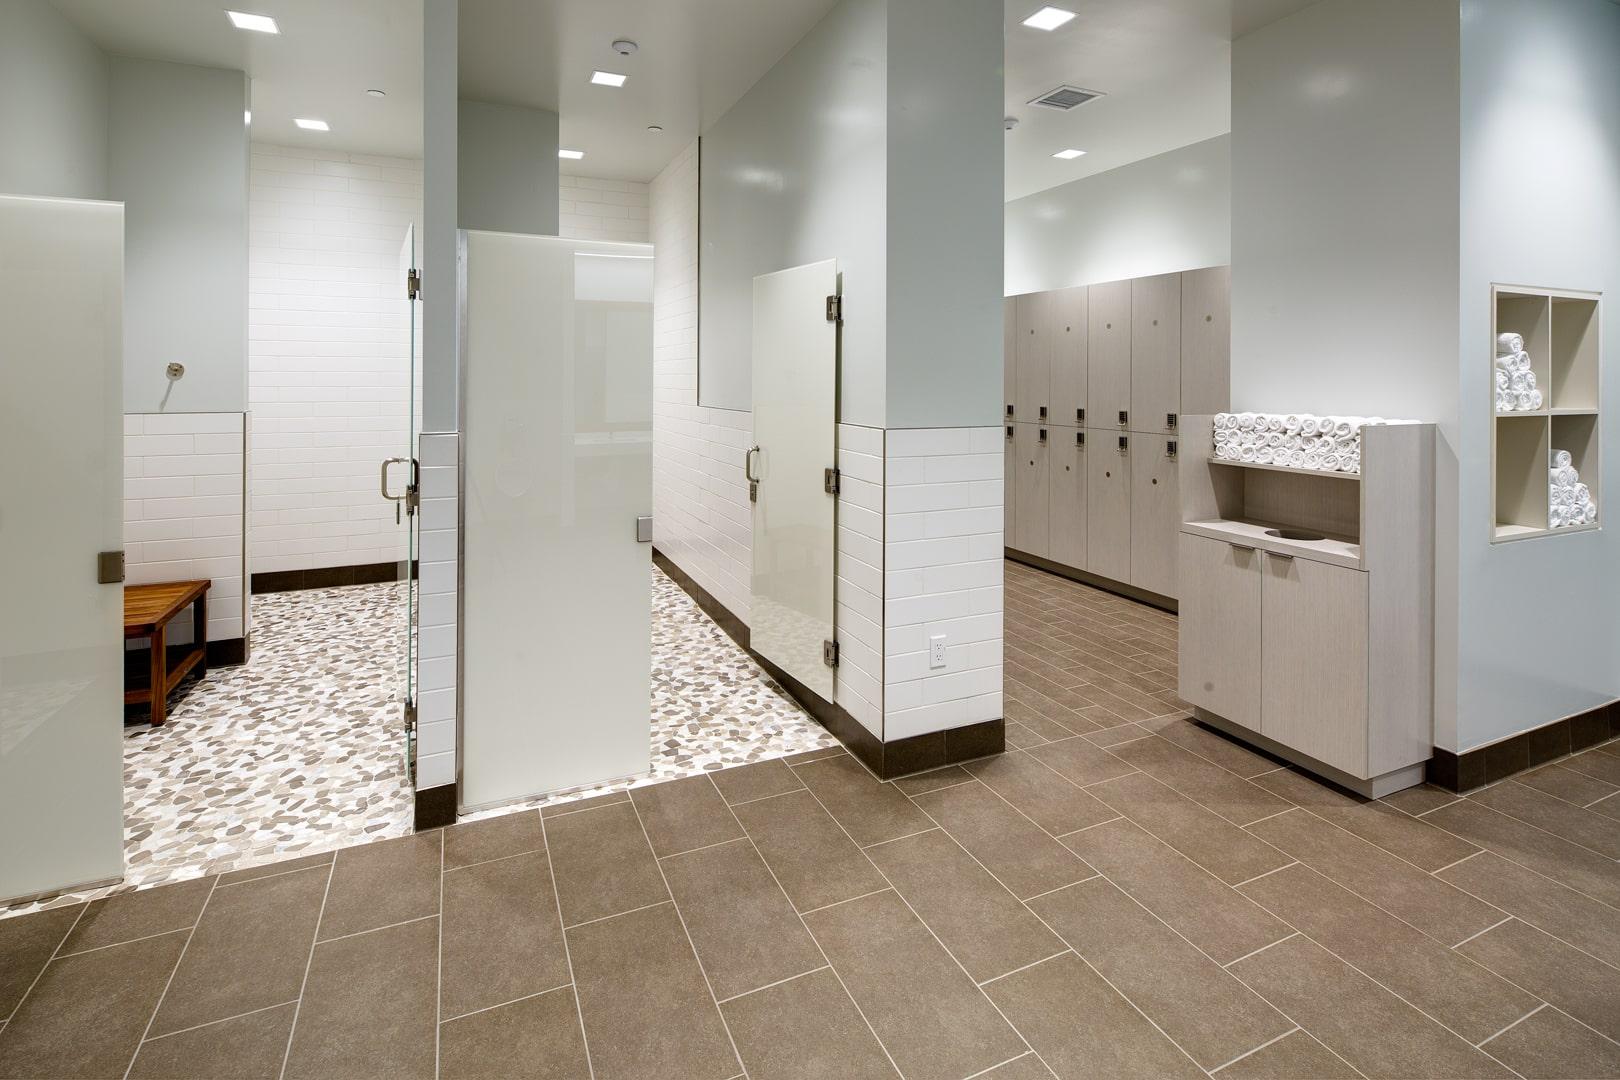 The-Torrance-Coworking-Spa-Bathroom.jpg